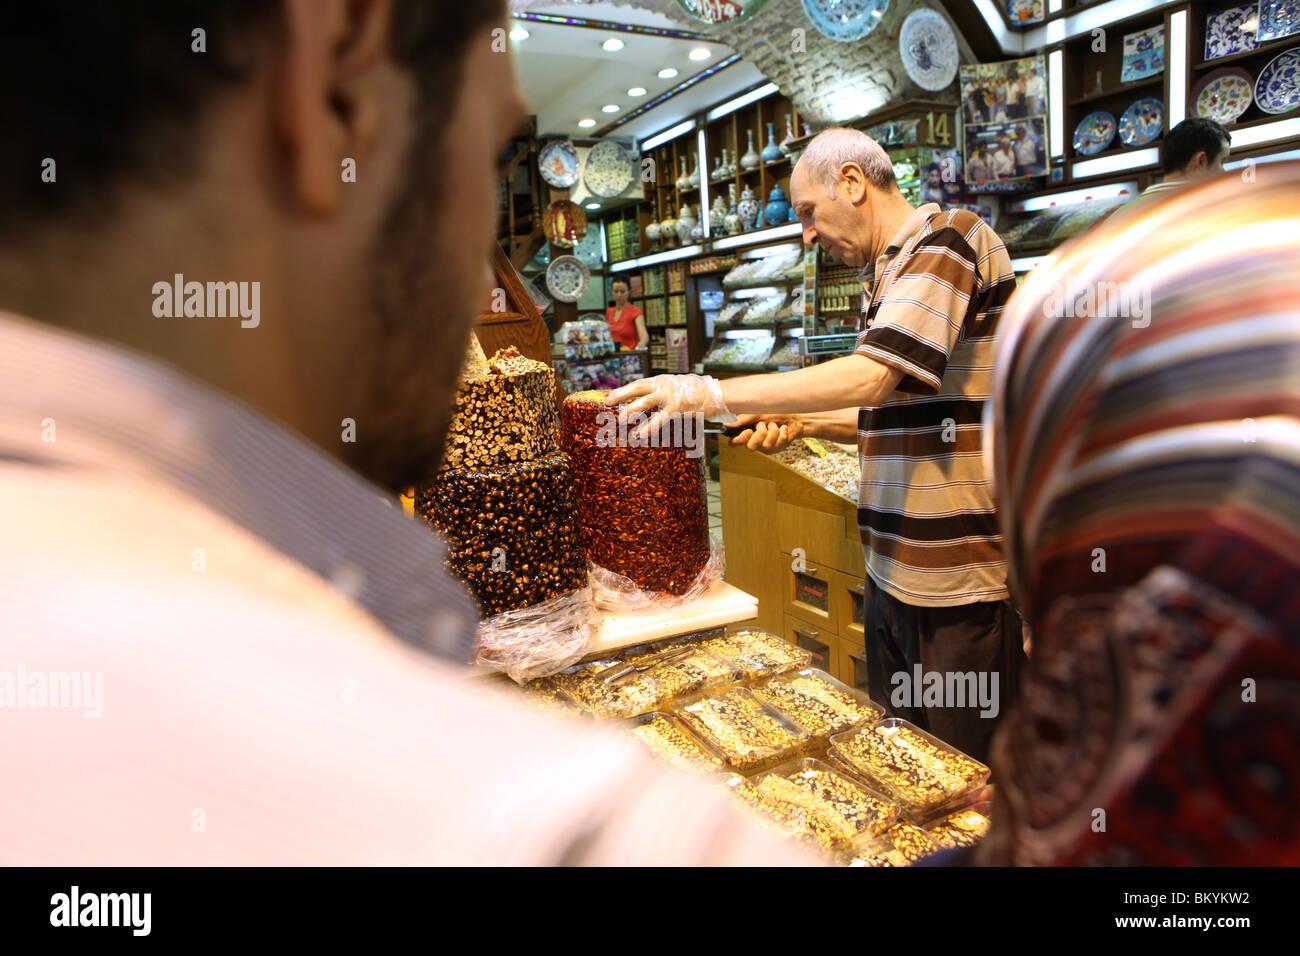 Halva sweets and turkish delight on display at the Spice Bazaar, Sultanahmet, Istanbul, Turkey. - Stock Image